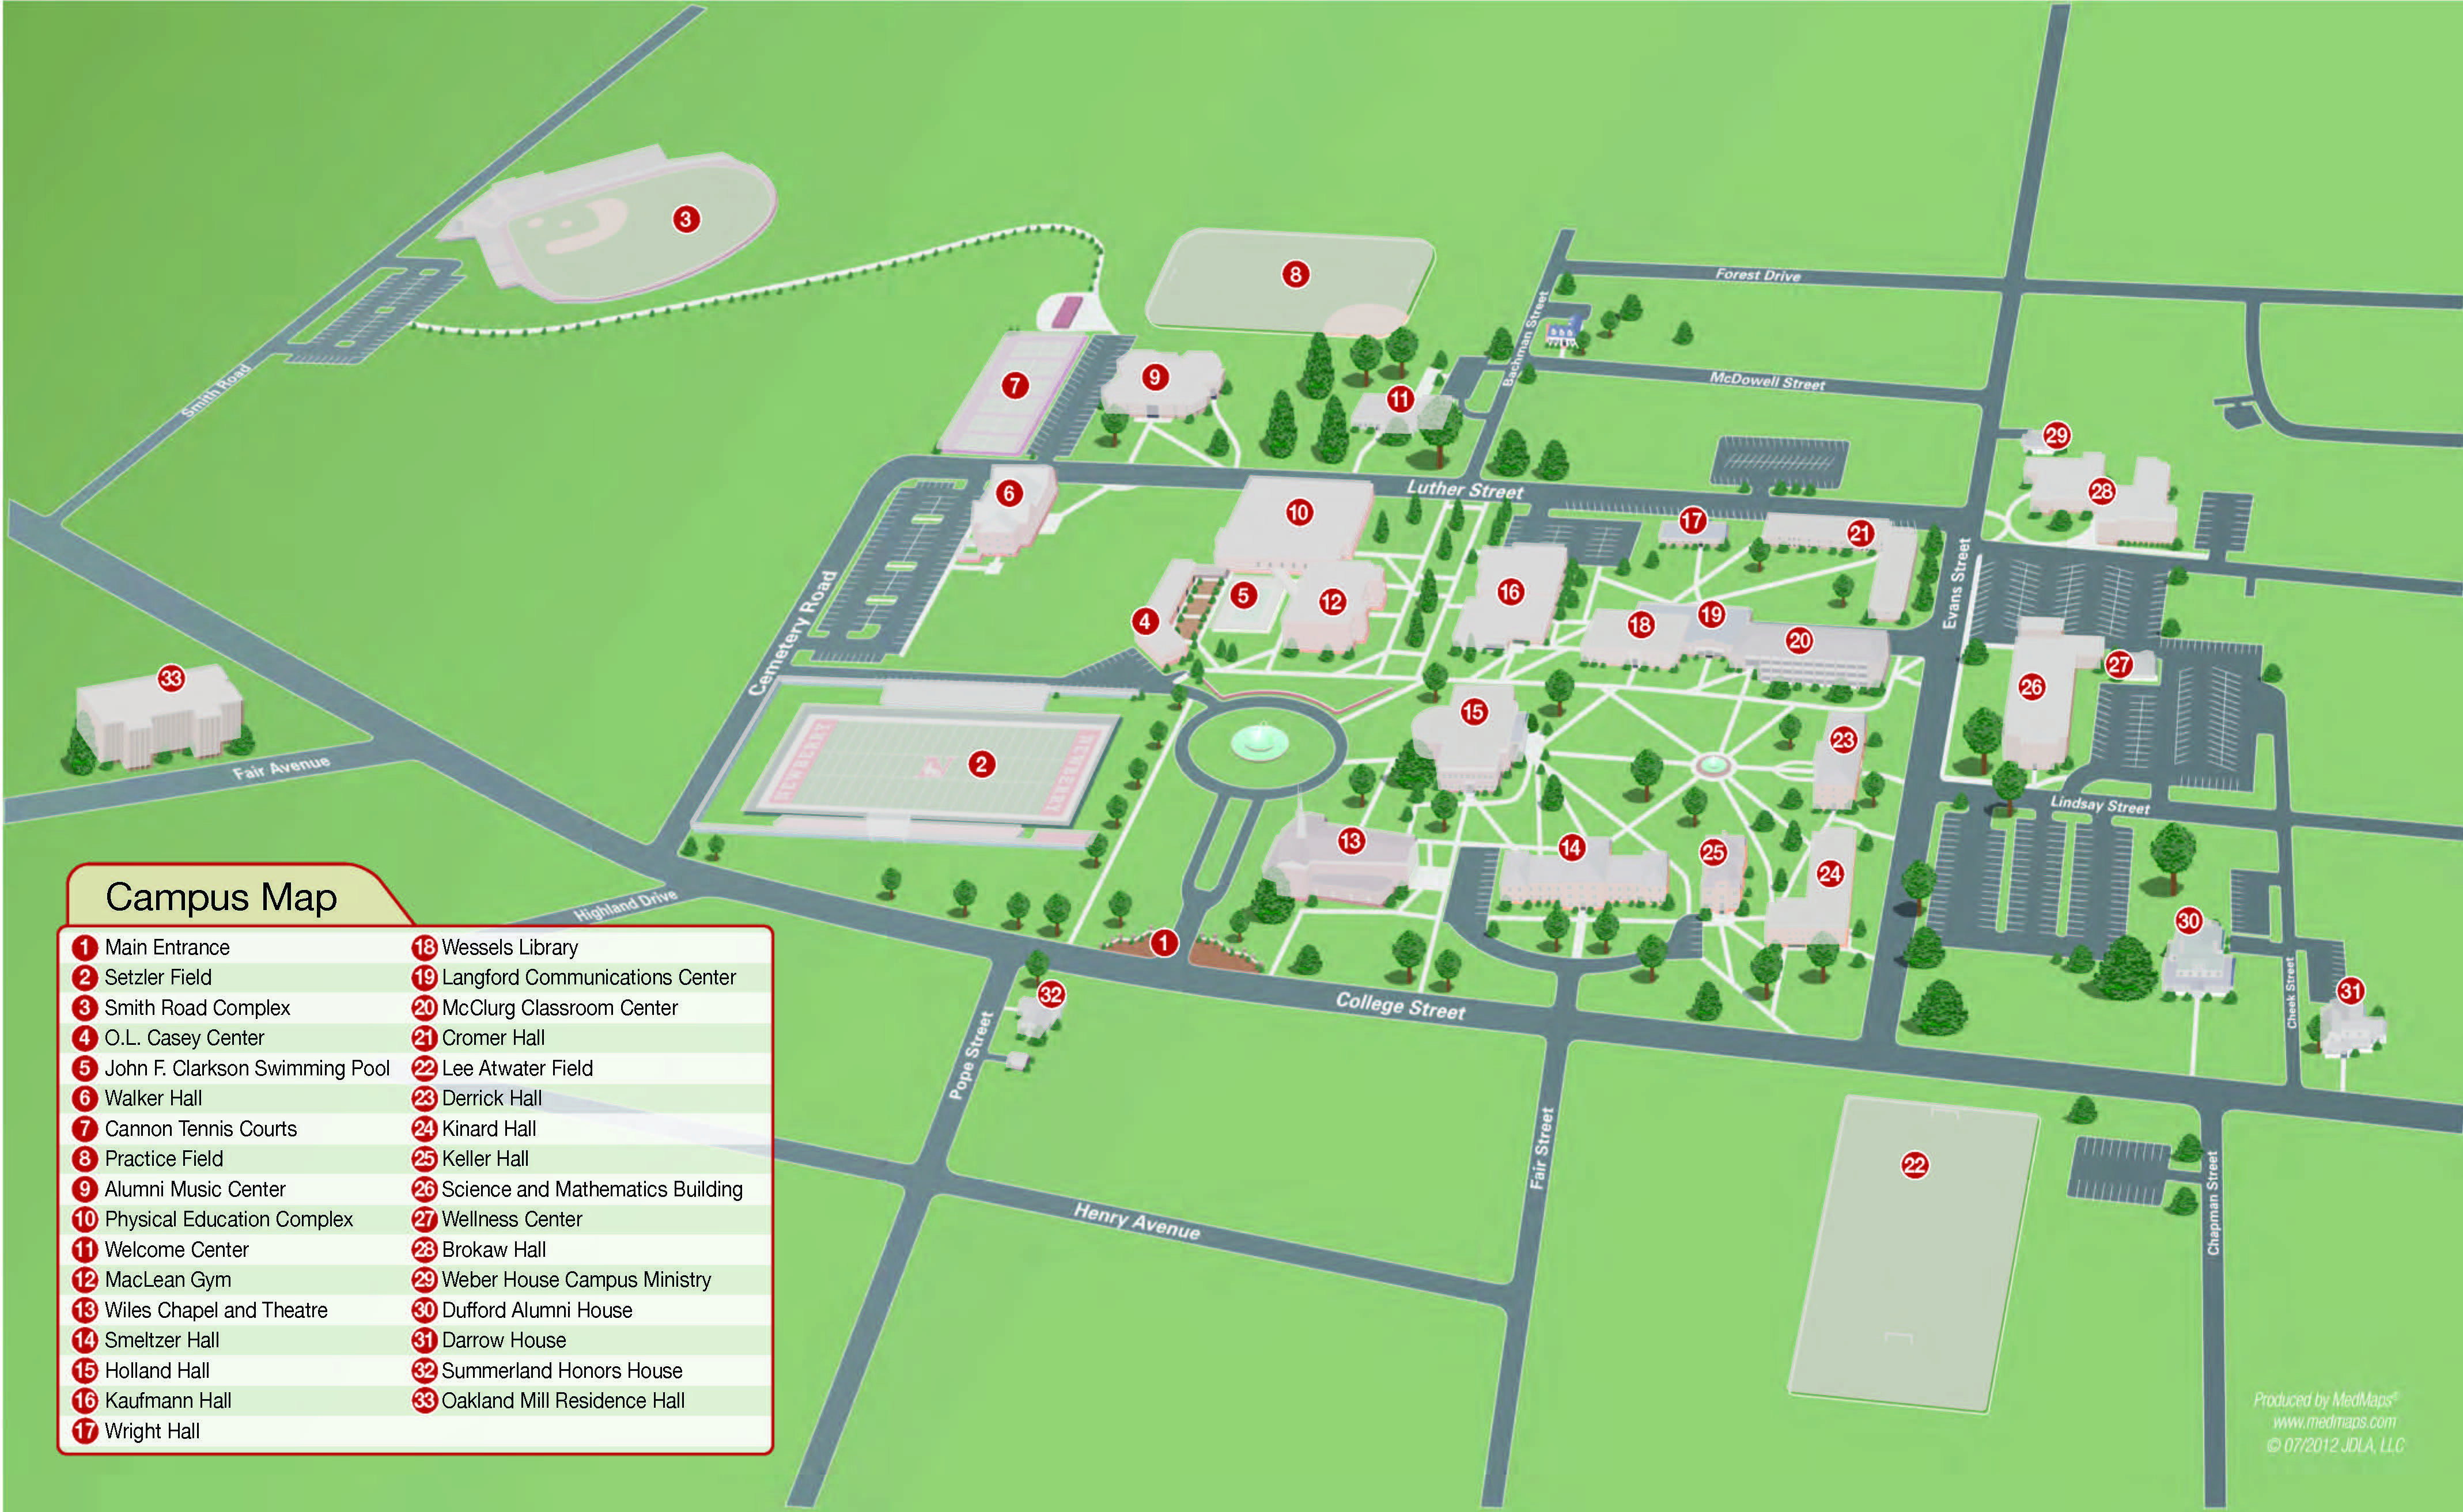 California University Of Pa Campus Map Printable Newberry College - California University Of Pa Campus Map